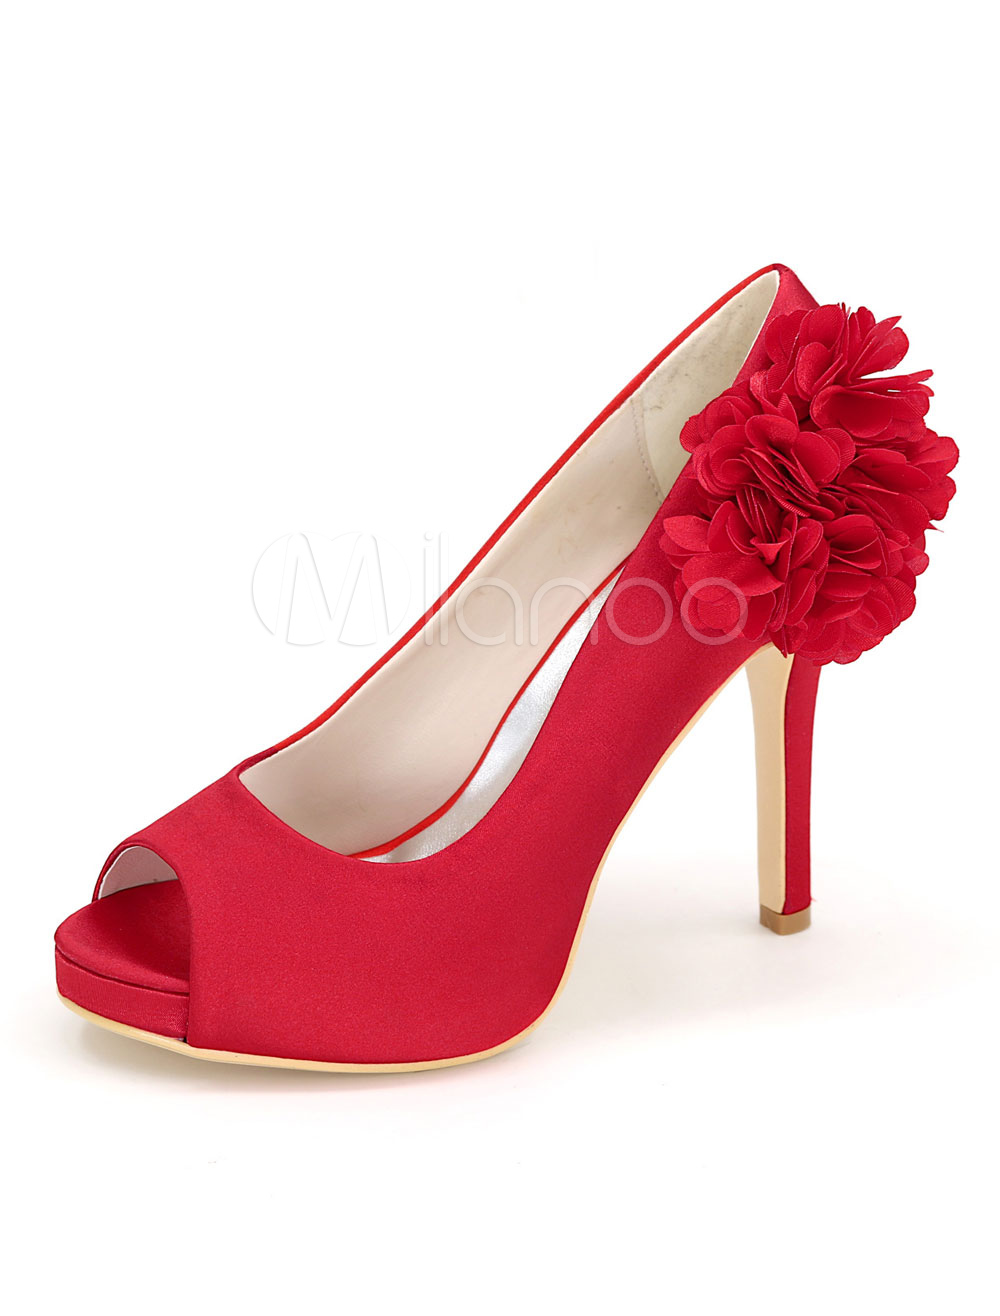 Women High Heels Red Wedding Shoes Peep Toe Flowers Slip On Bridal Shoes